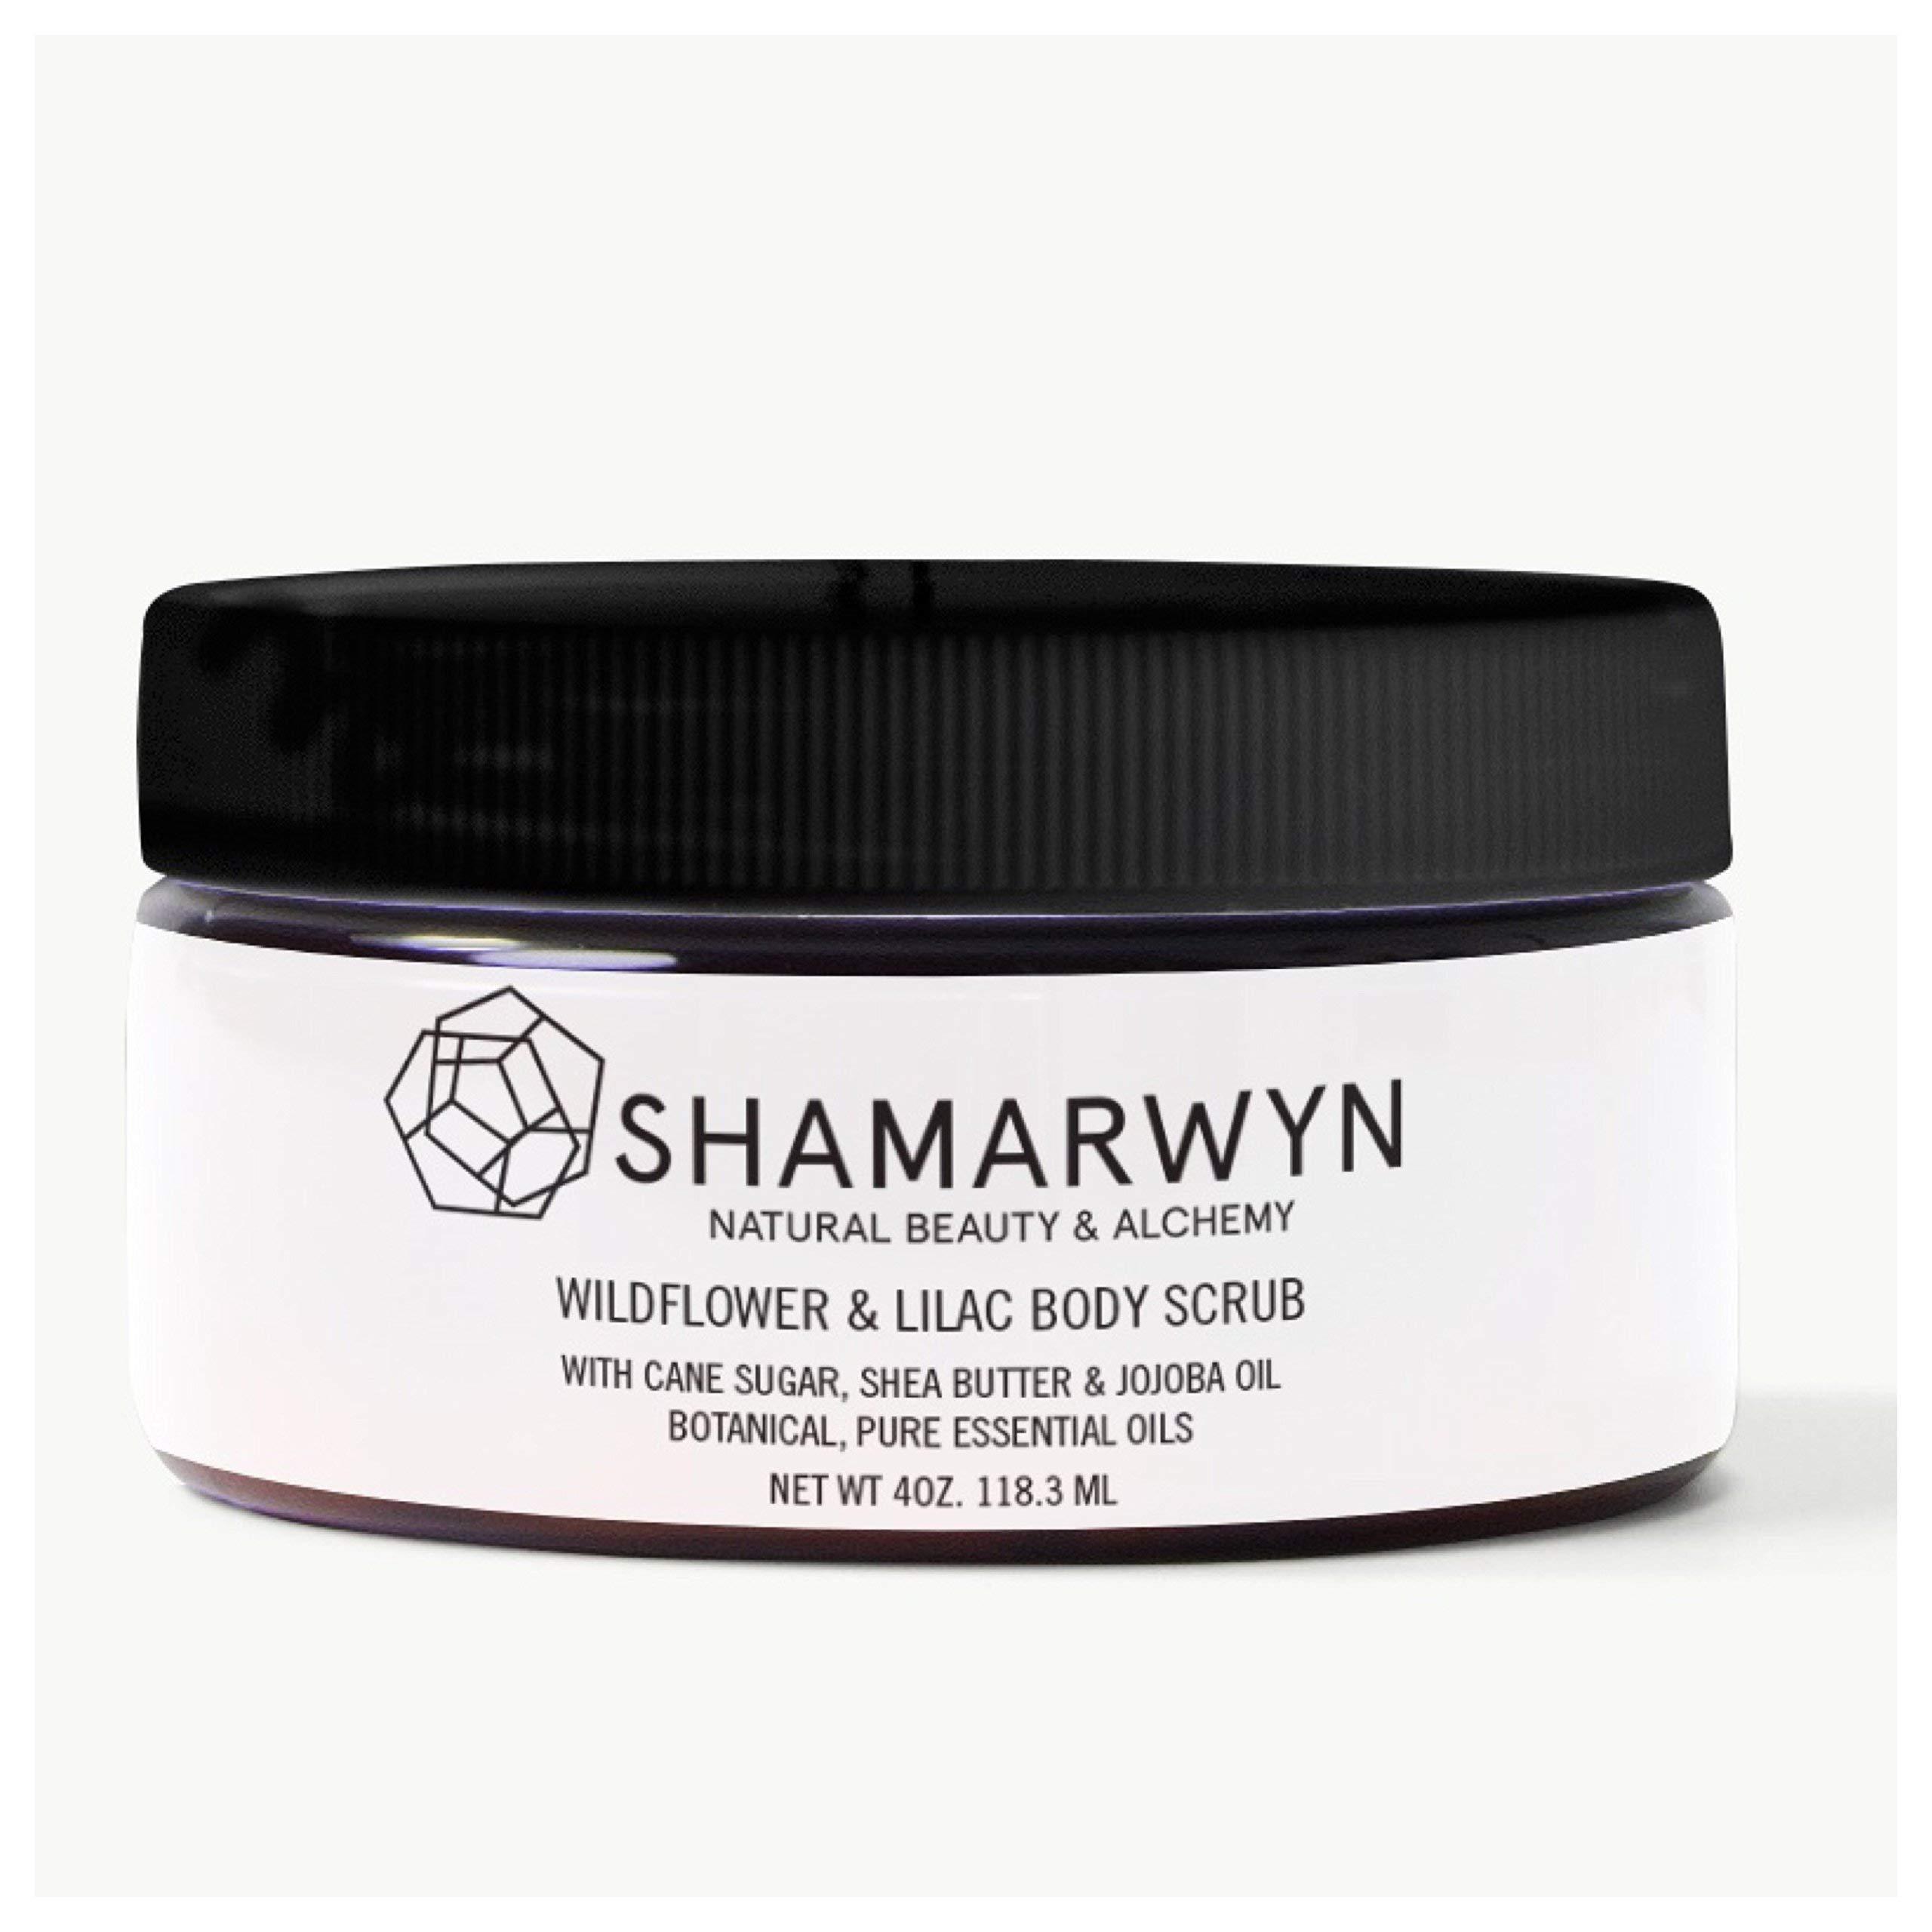 Body Scrub, Wildflower & Lilac, Natural-Organic, Cane Sugar, Shea Butter, Jojoba Oil, Exfoliator 4oz